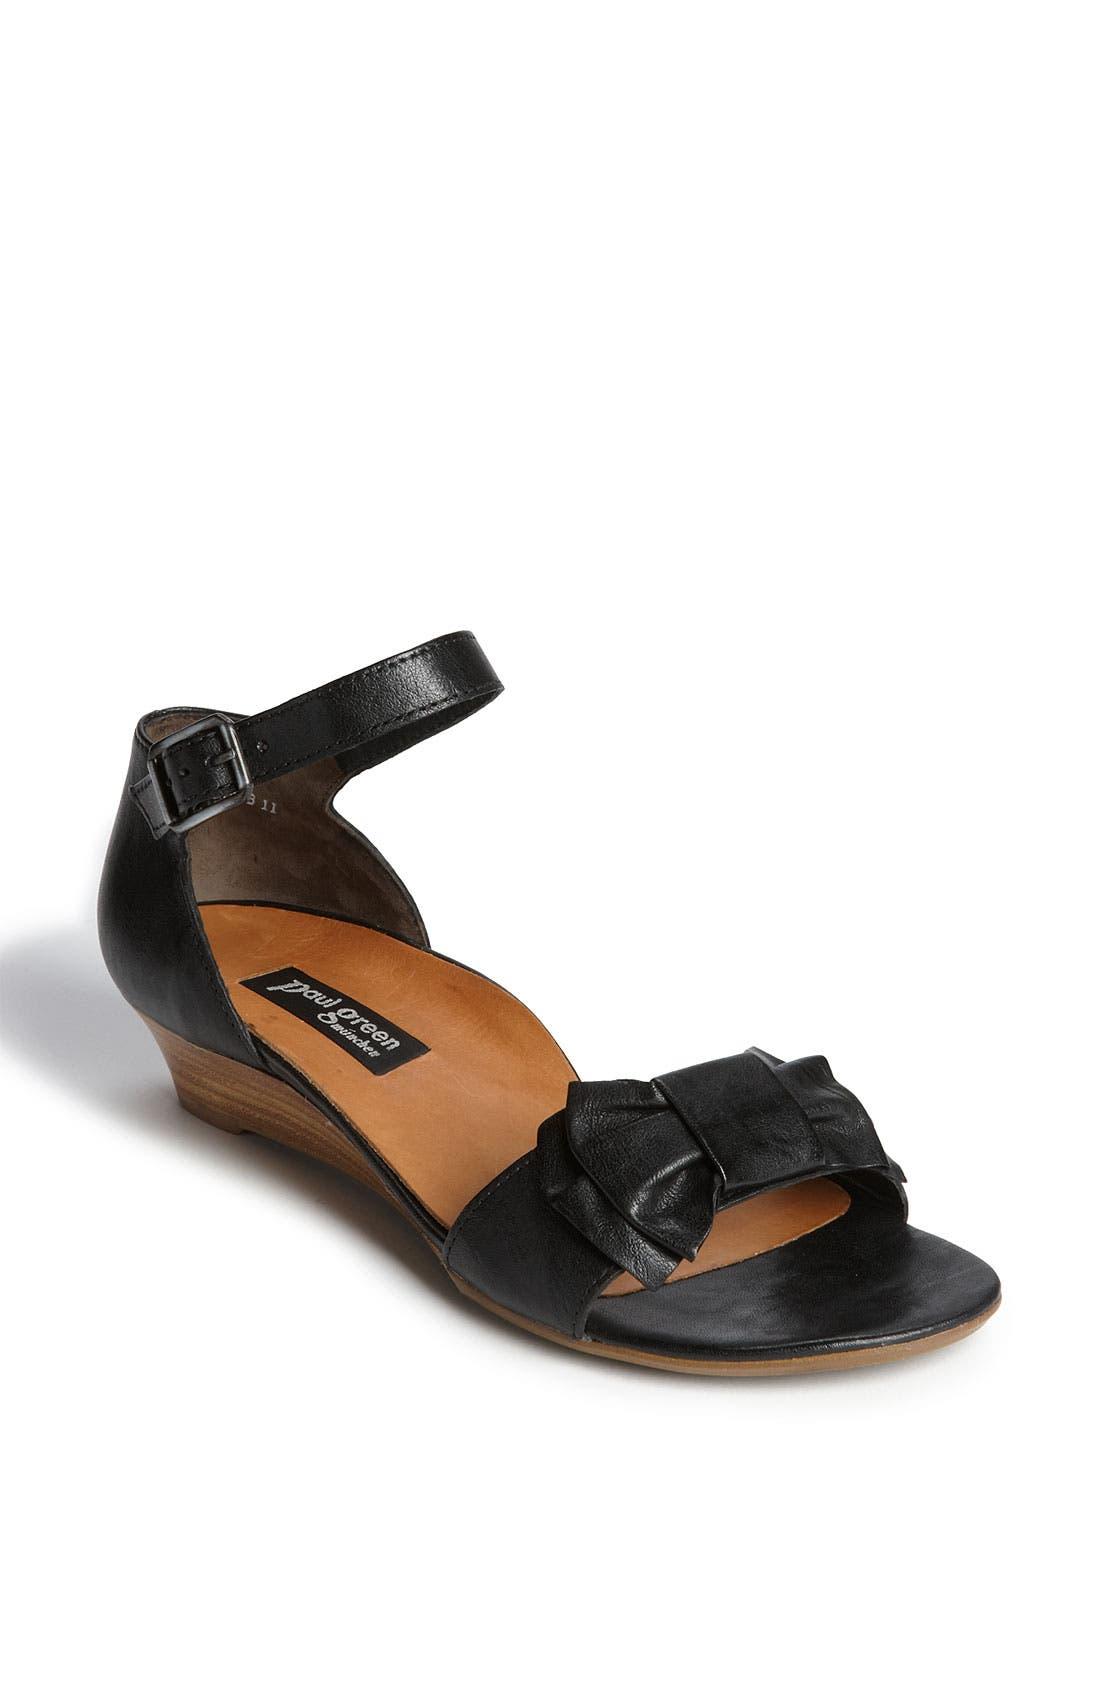 Main Image - Paul Green 'Lexi Bow' Sandal